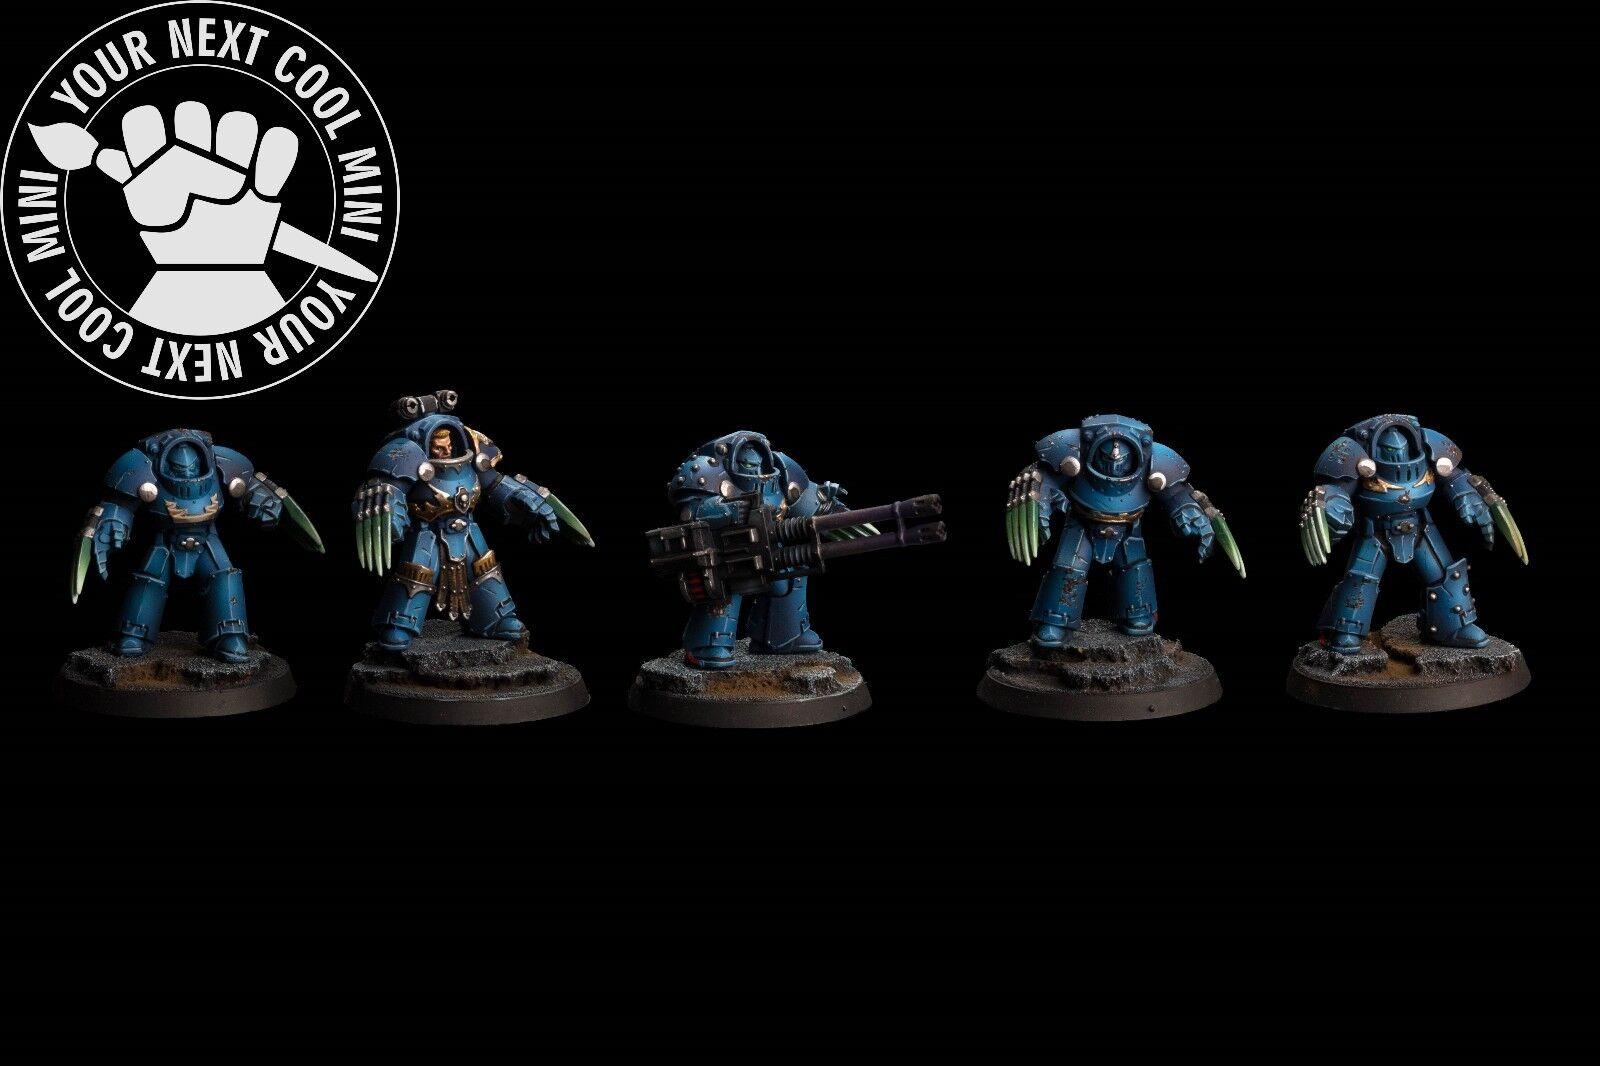 Warhammer 30K Space Space Space Marine Ultramarine Terminator Squad, 5 PRO PAINT miniatures 6db2b2